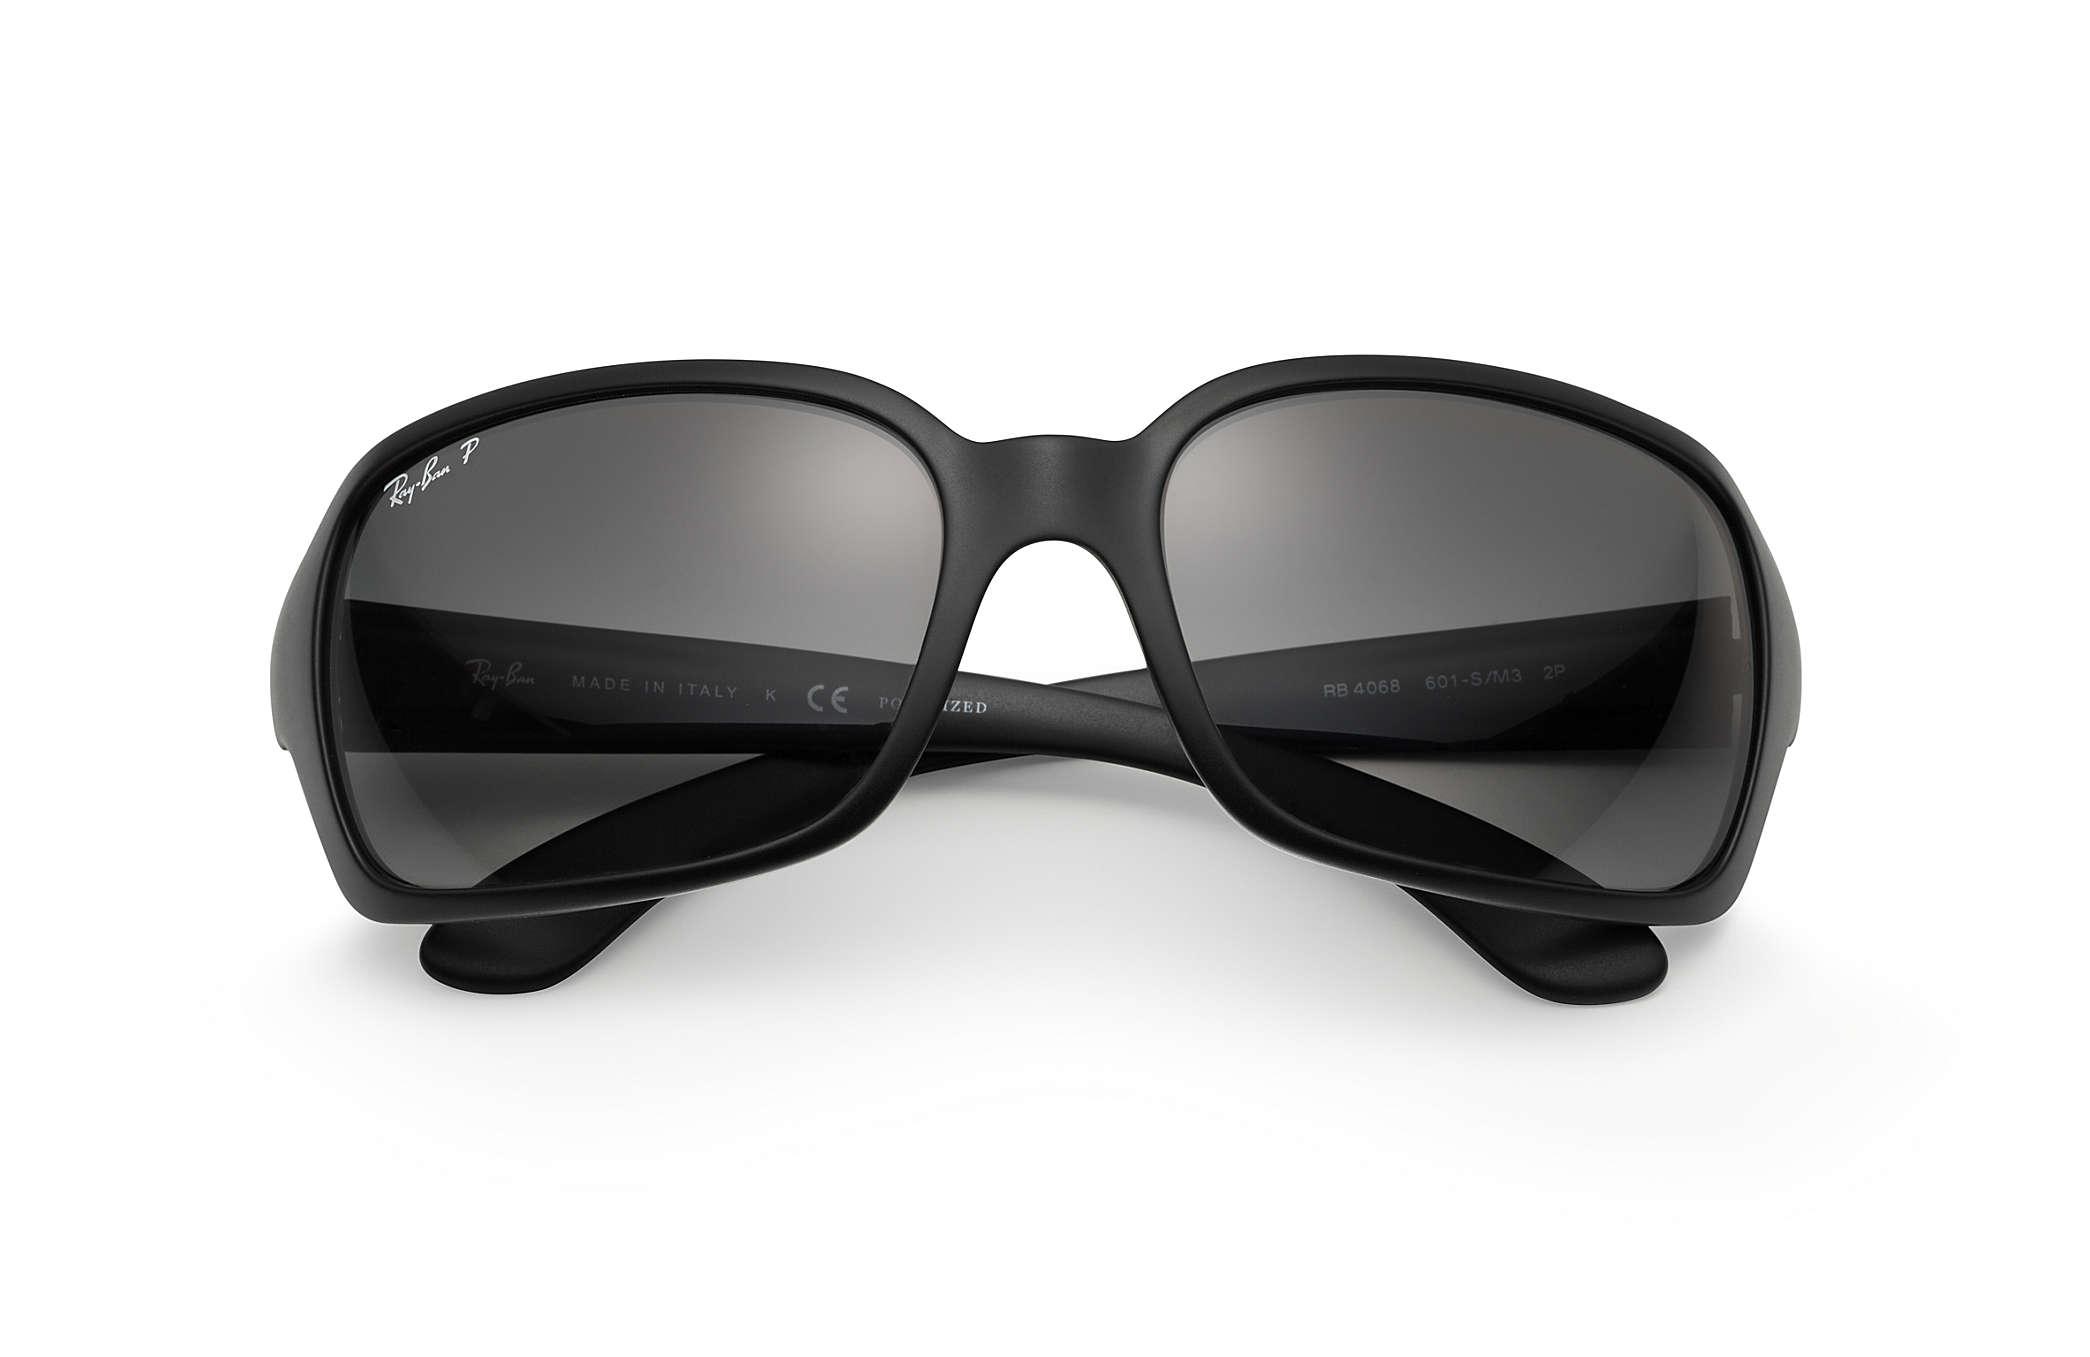 67ea19743a ray ban 4068 black polarized. Ray Ban RB4068 Highstreet Polarized 642 57  Sunglasses Review - YouTube